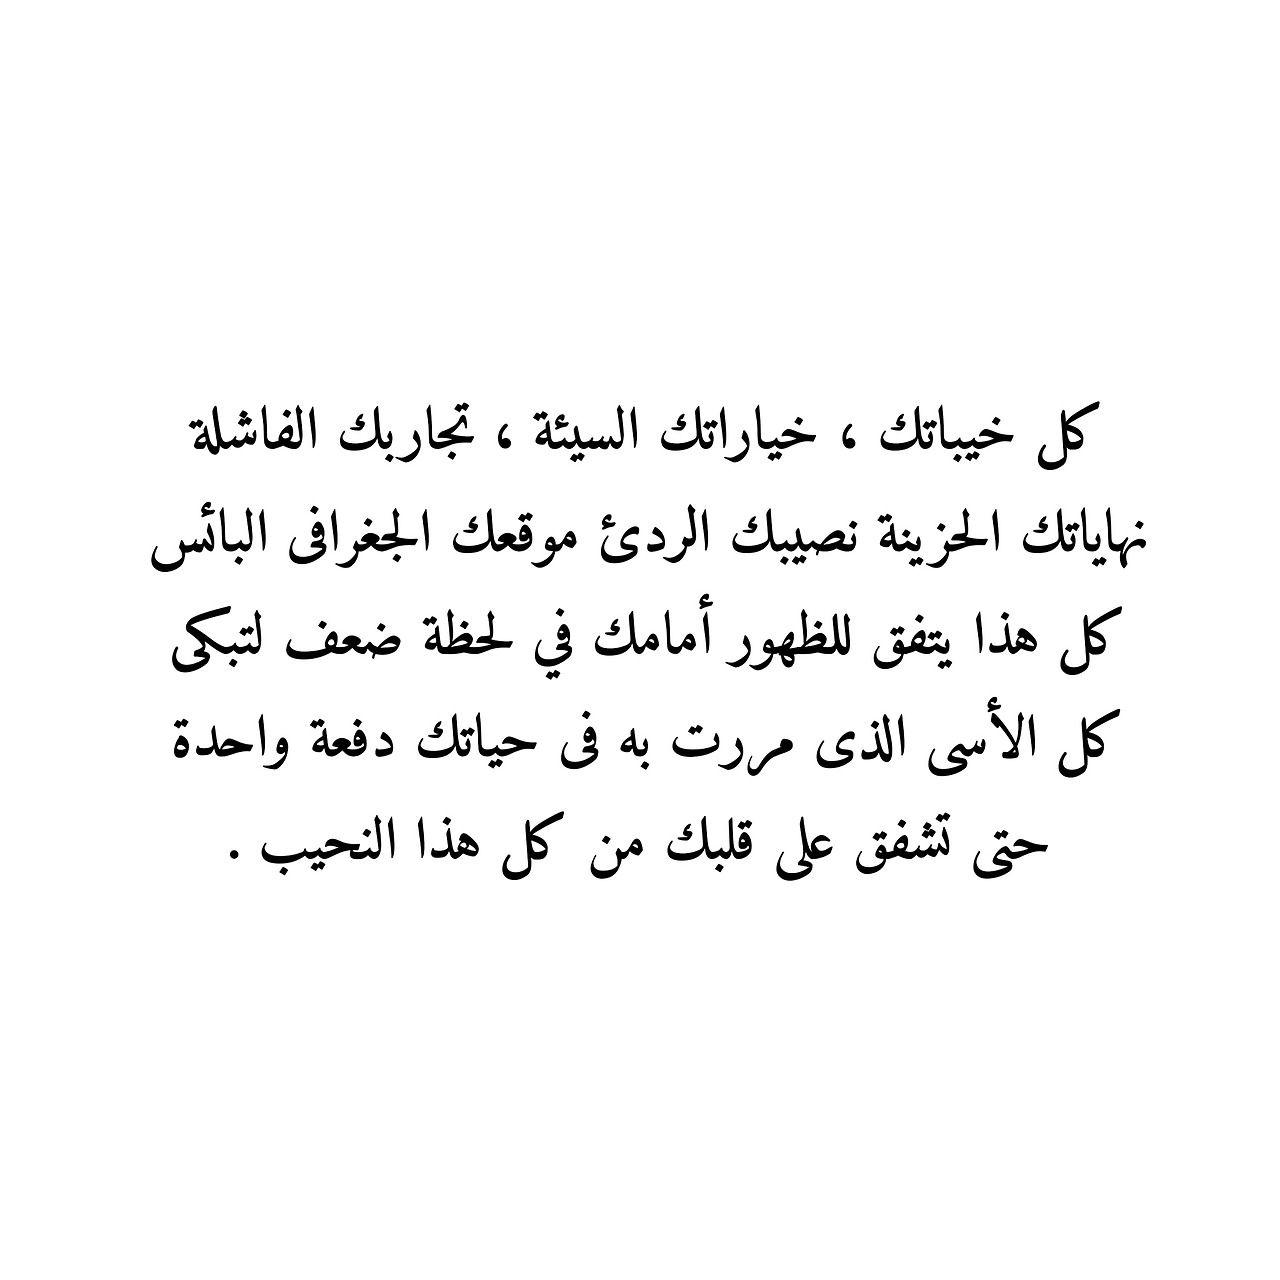 Quotes In Arabic Pinlena Lolo On اقتباسات  Pinterest  Arabic Quotes Arabic